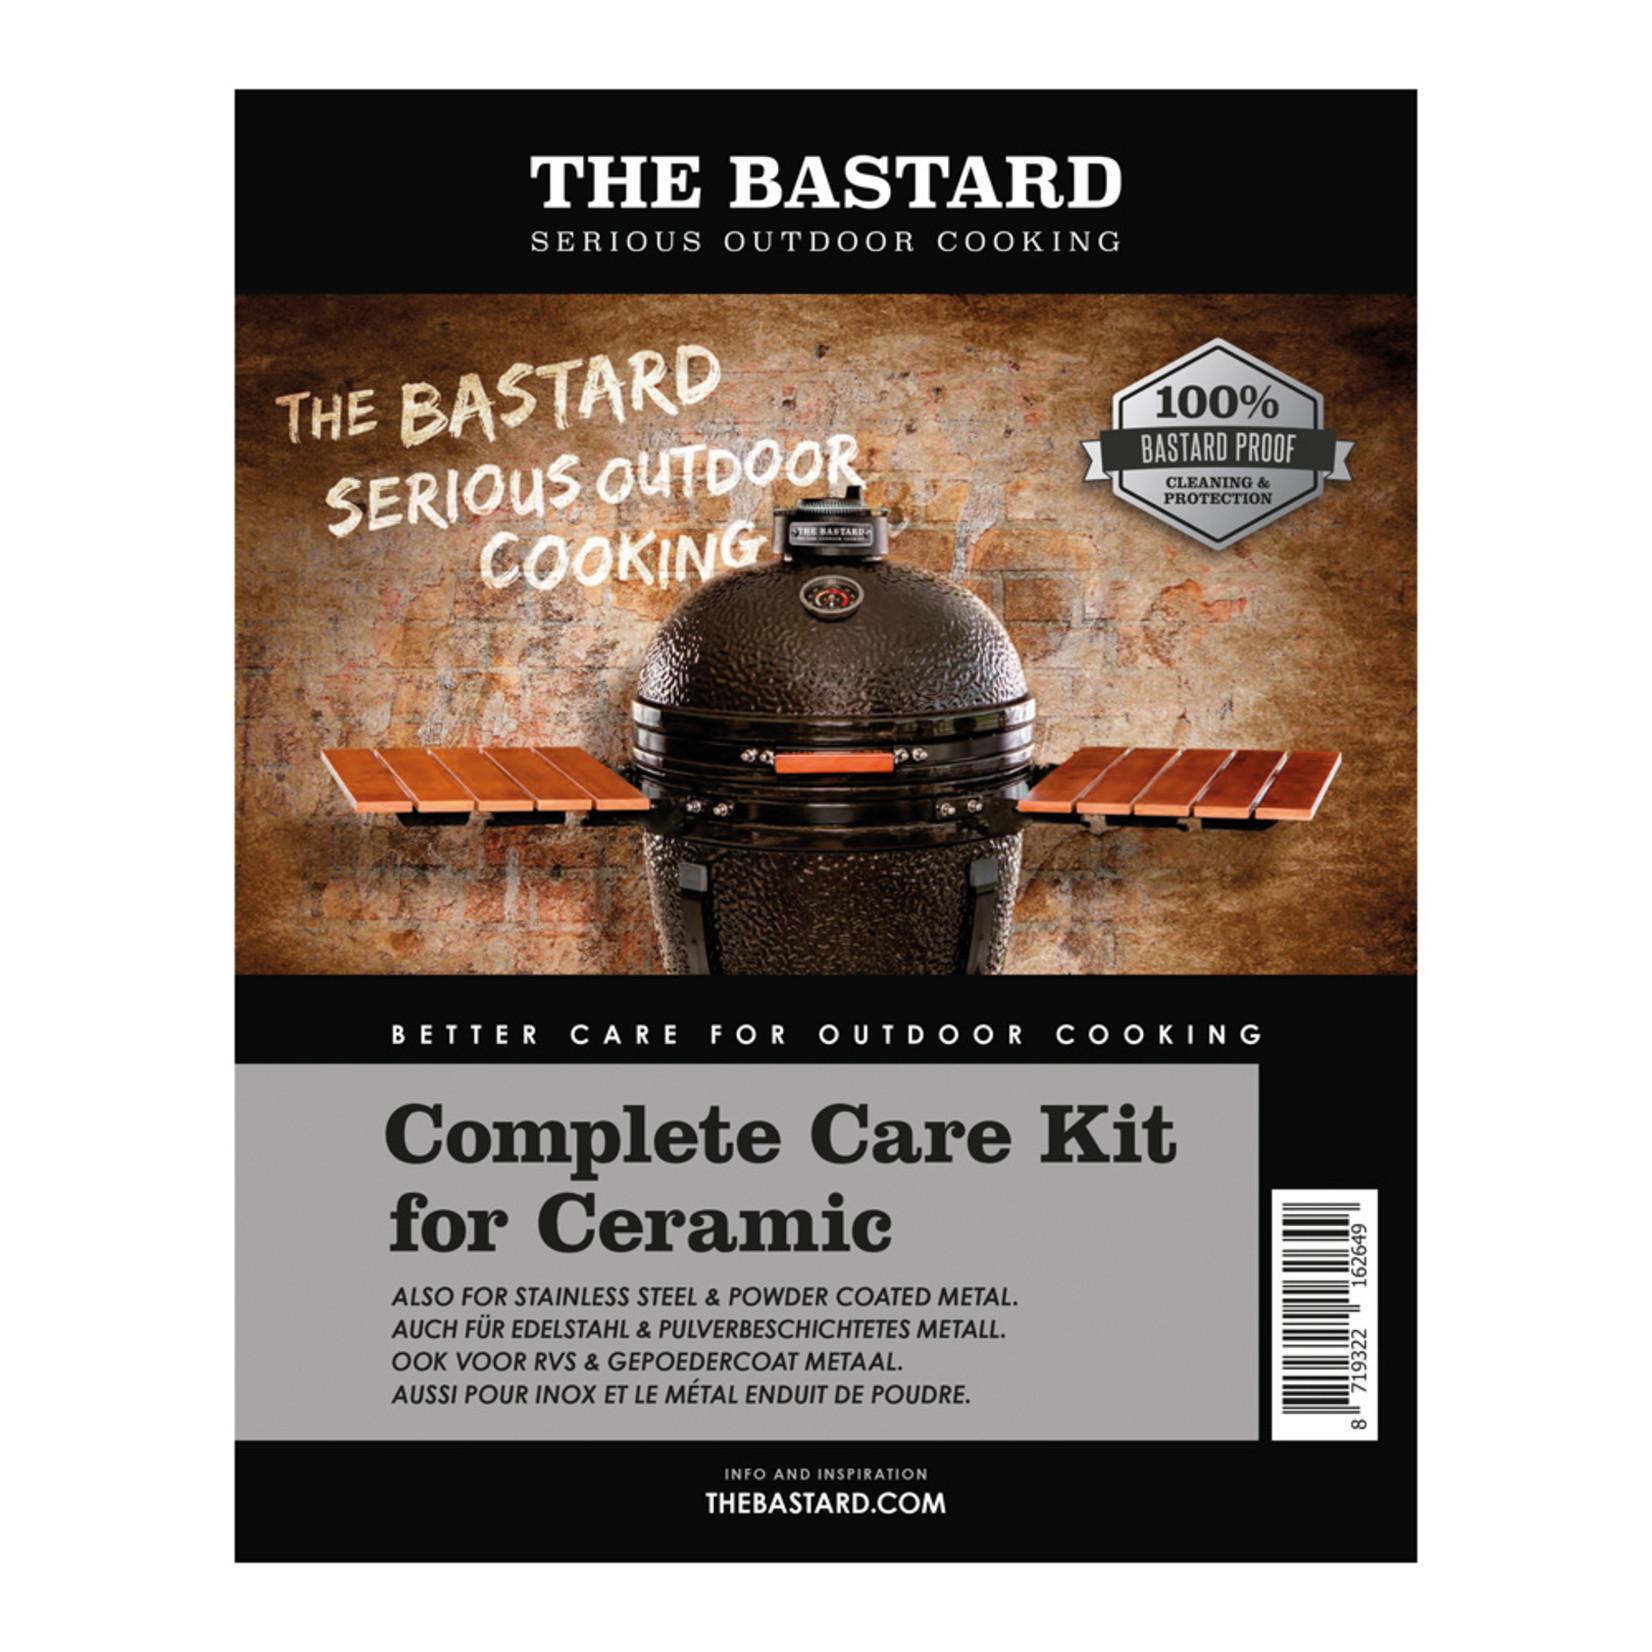 The Bastard Kit cleaner & wax polish